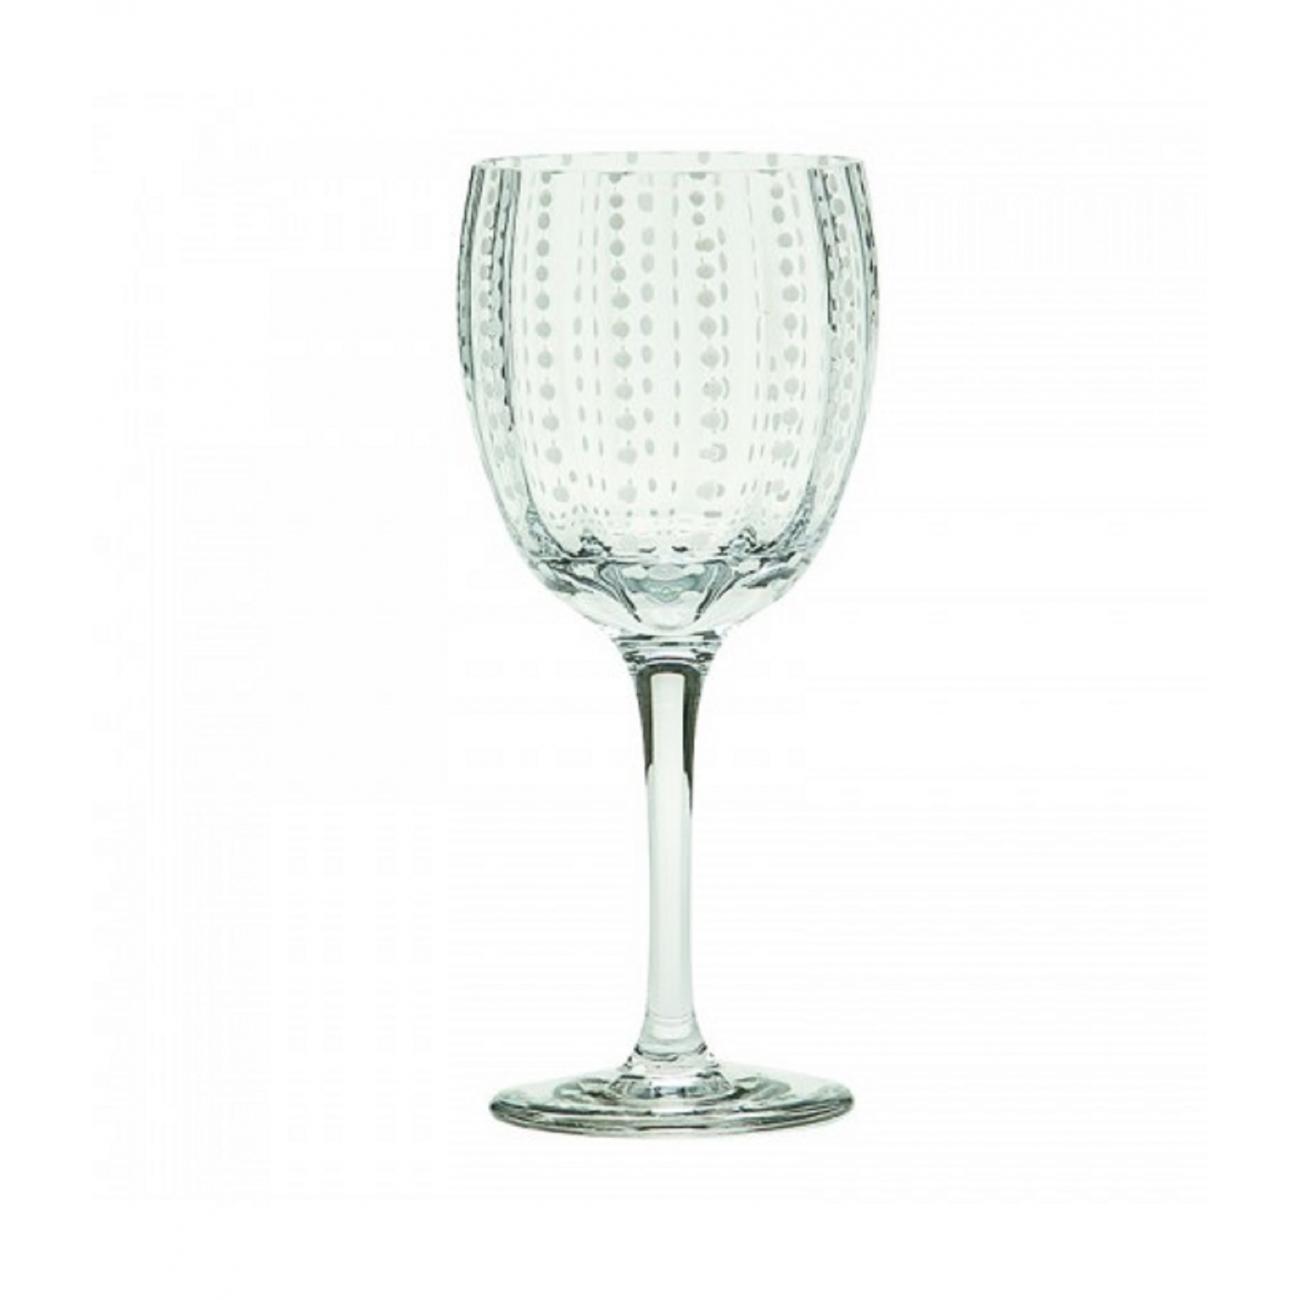 Zafferano Perle Set 2 Wine Glass Clear